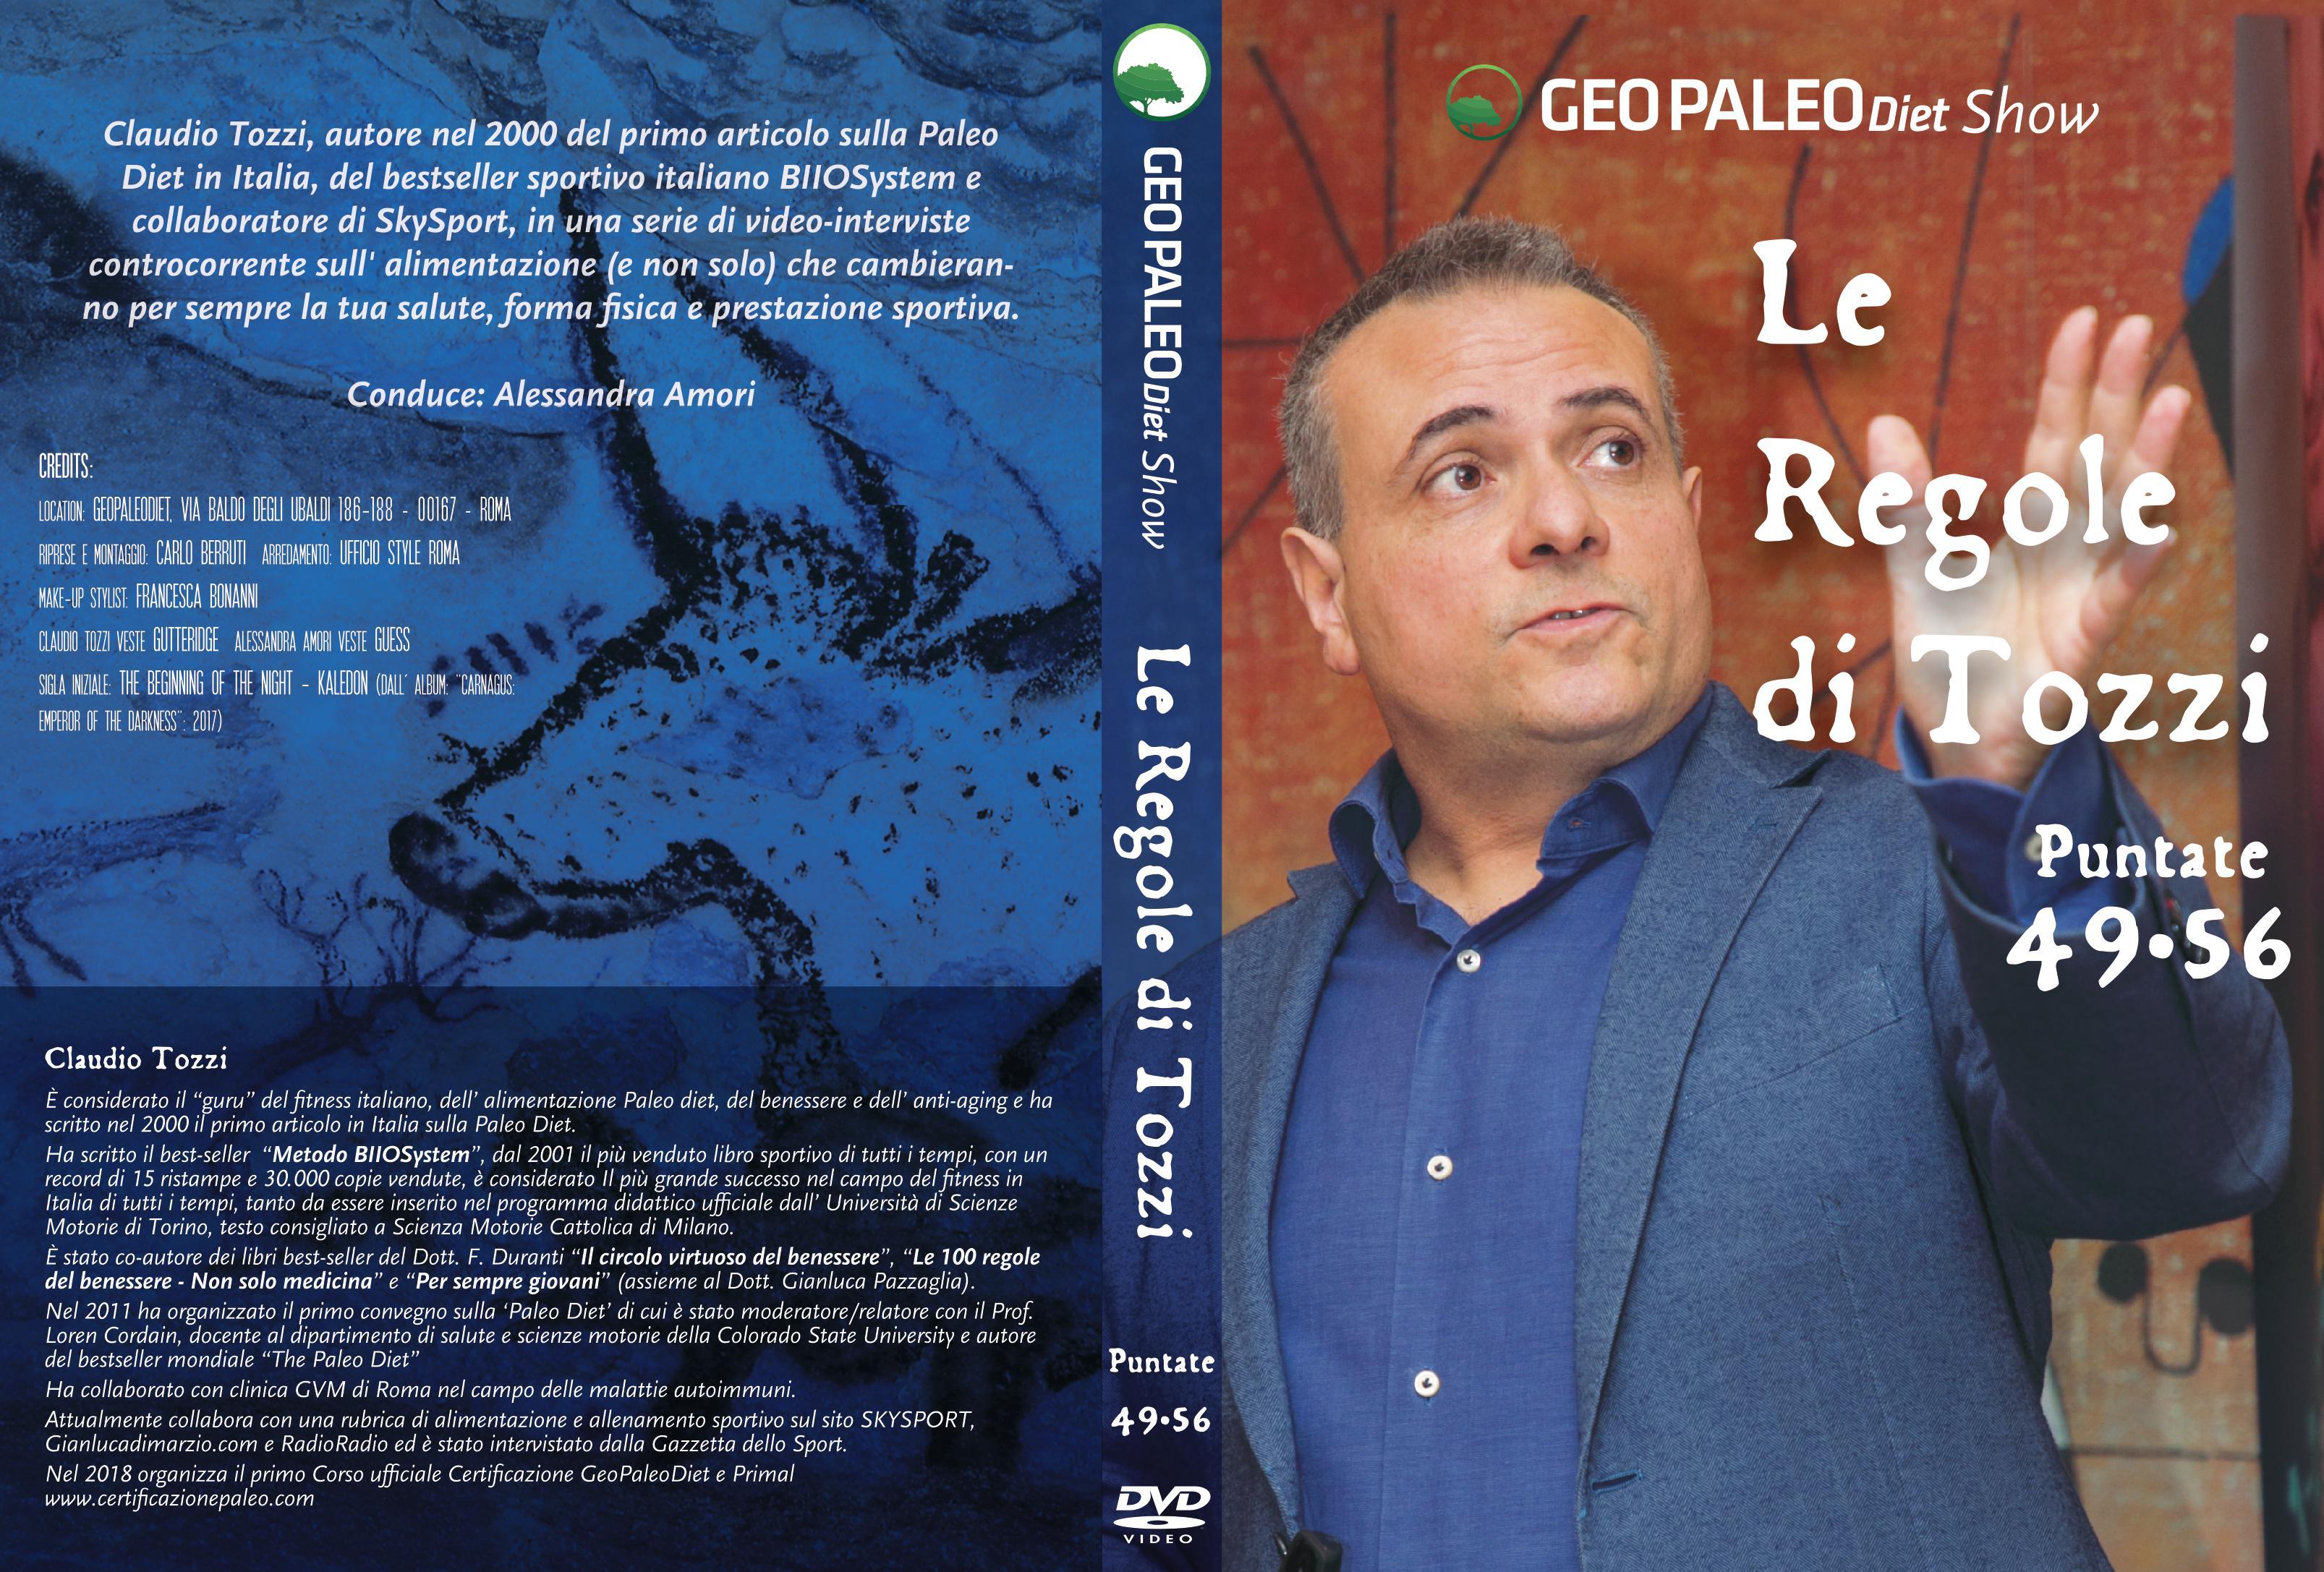 Le Regole di Tozzi - GeoPaleoDiet Show. DVD Video doppio - Puntate 49-56